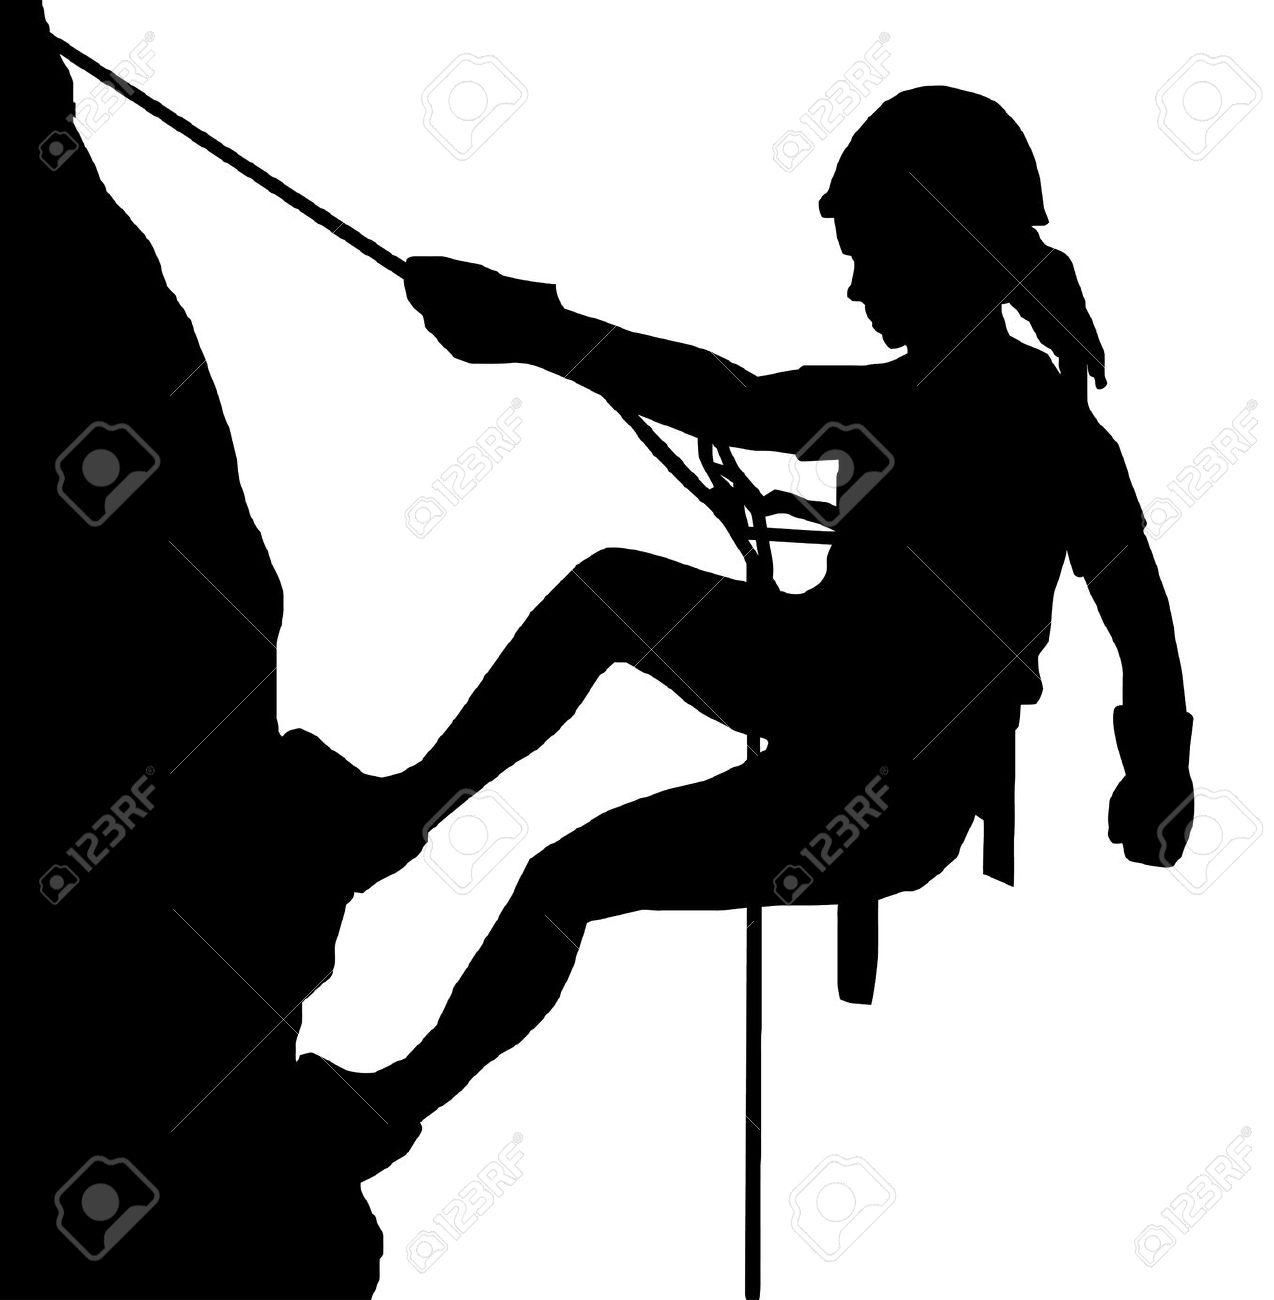 Rock climbing clipart free - ClipartFest-Rock climbing clipart free - ClipartFest-10